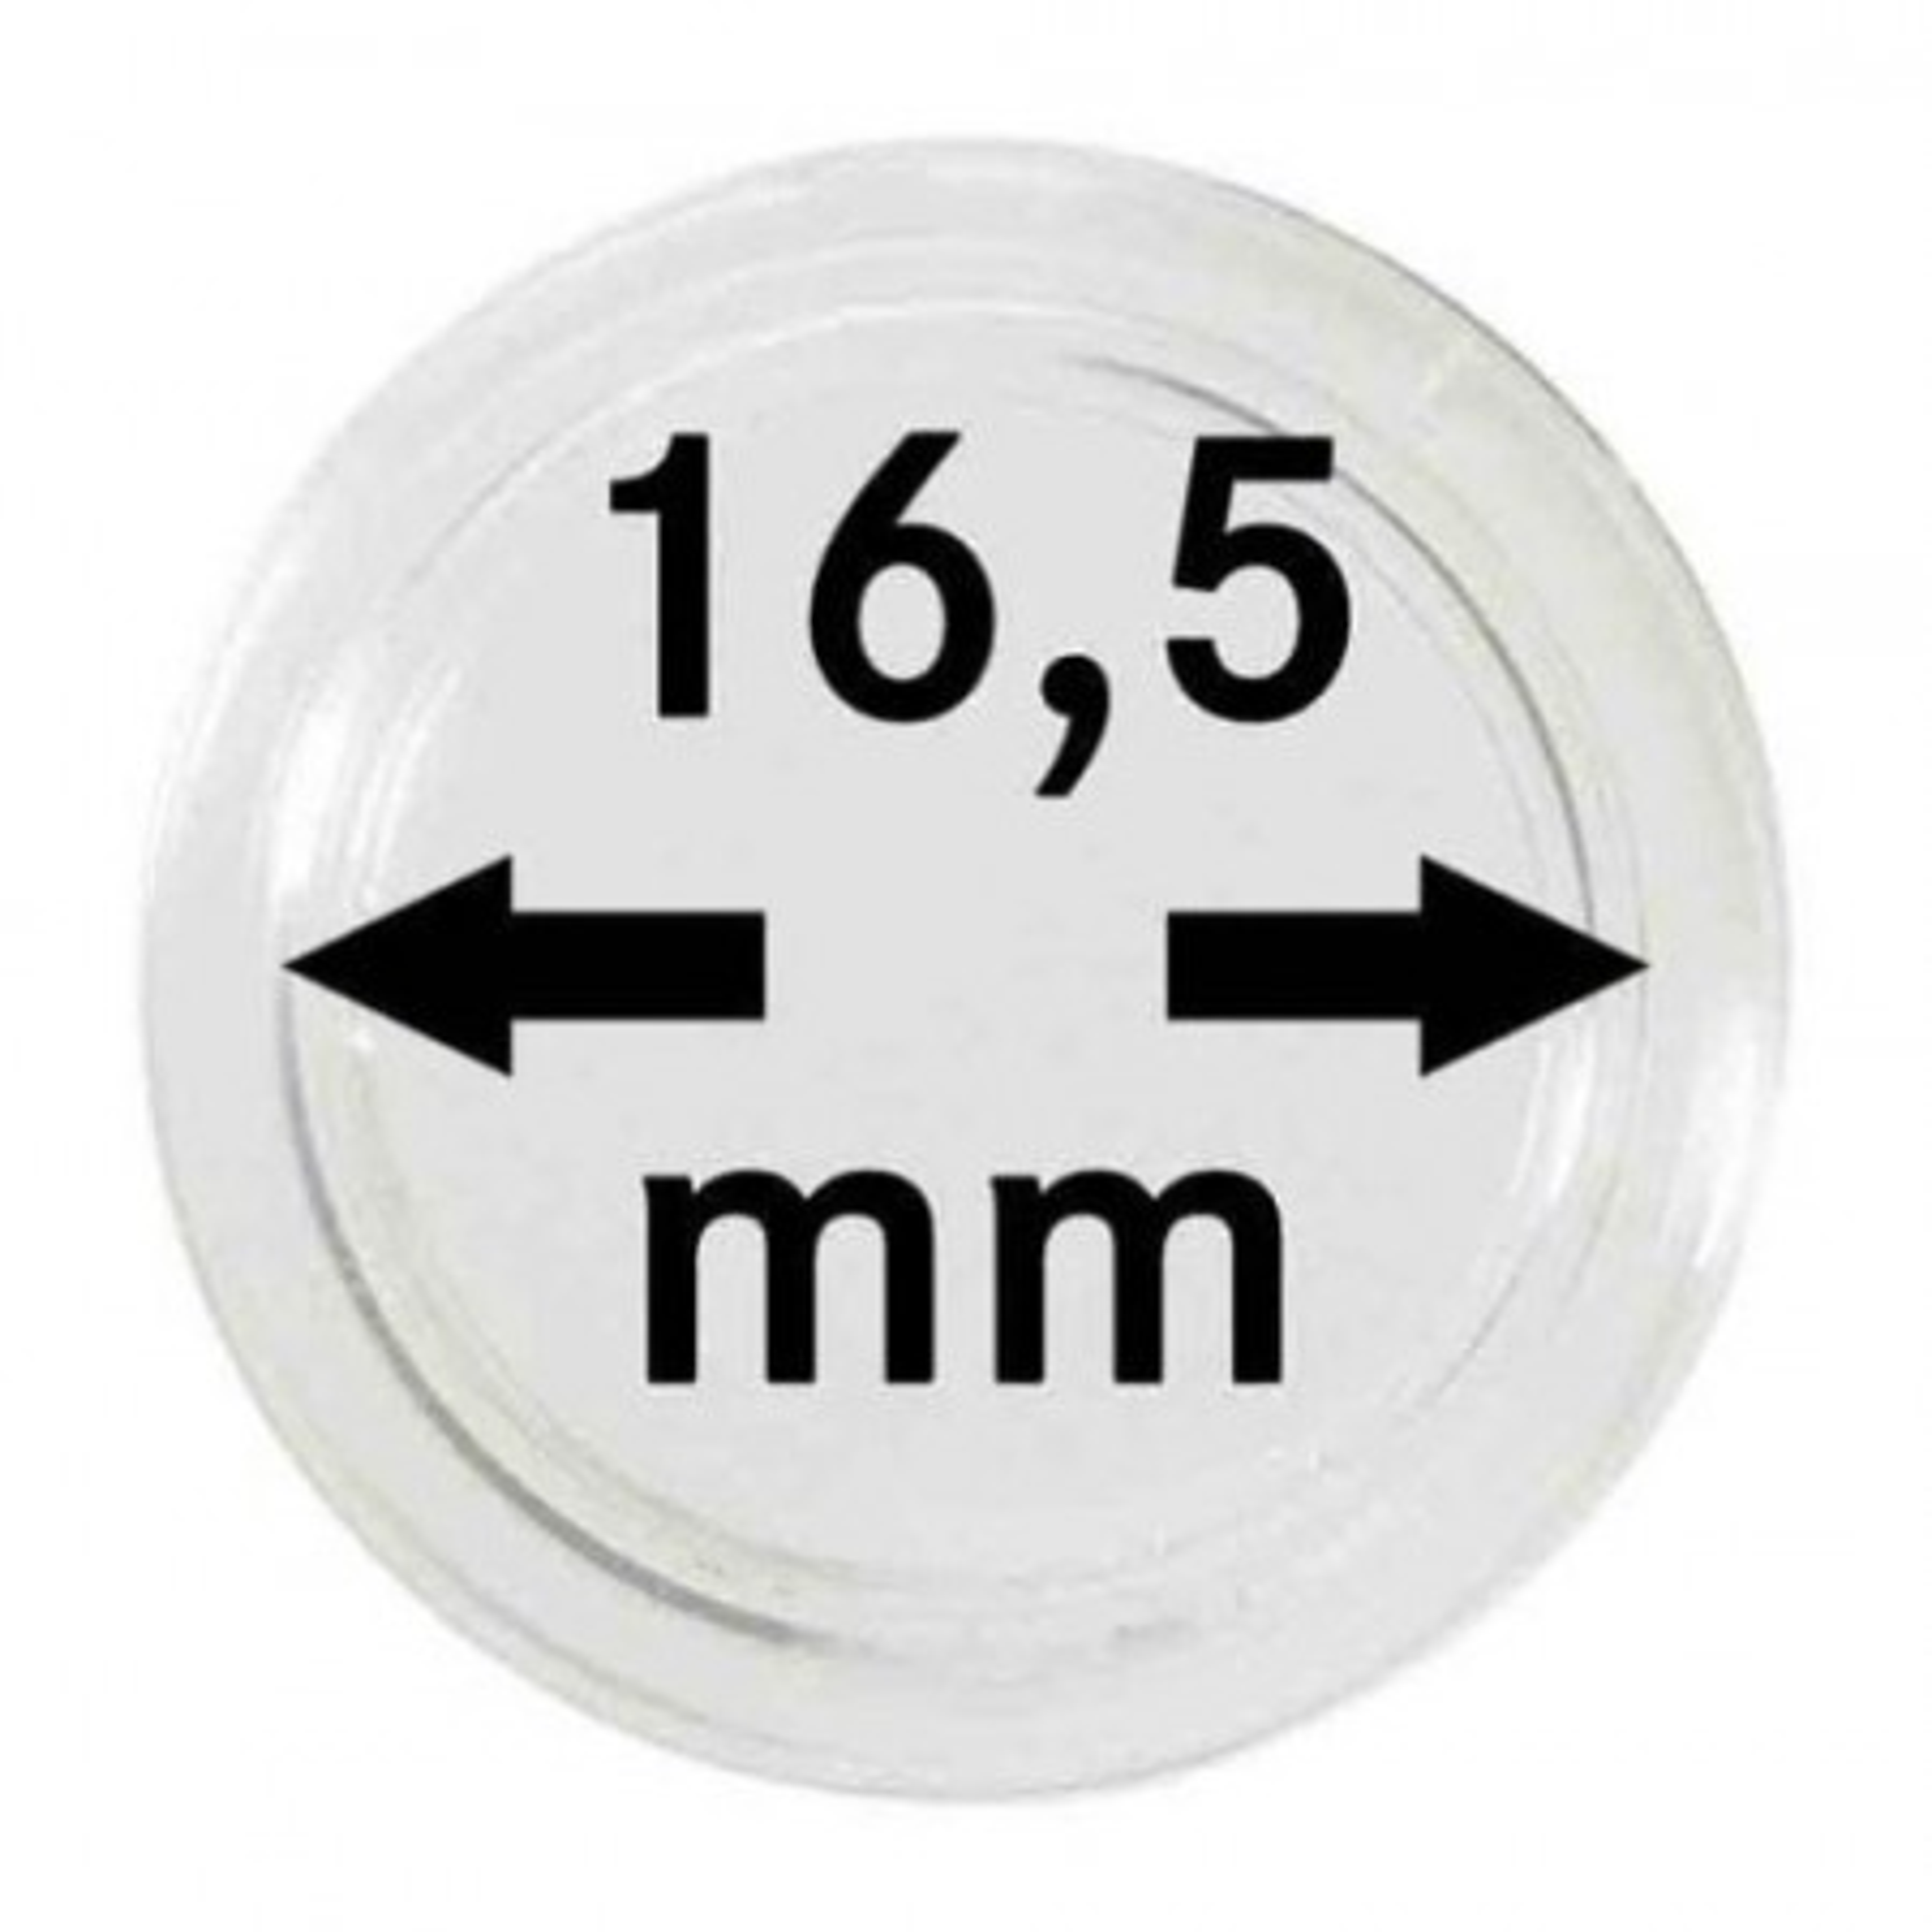 16.5 mm Leuchtturm muntcapsules